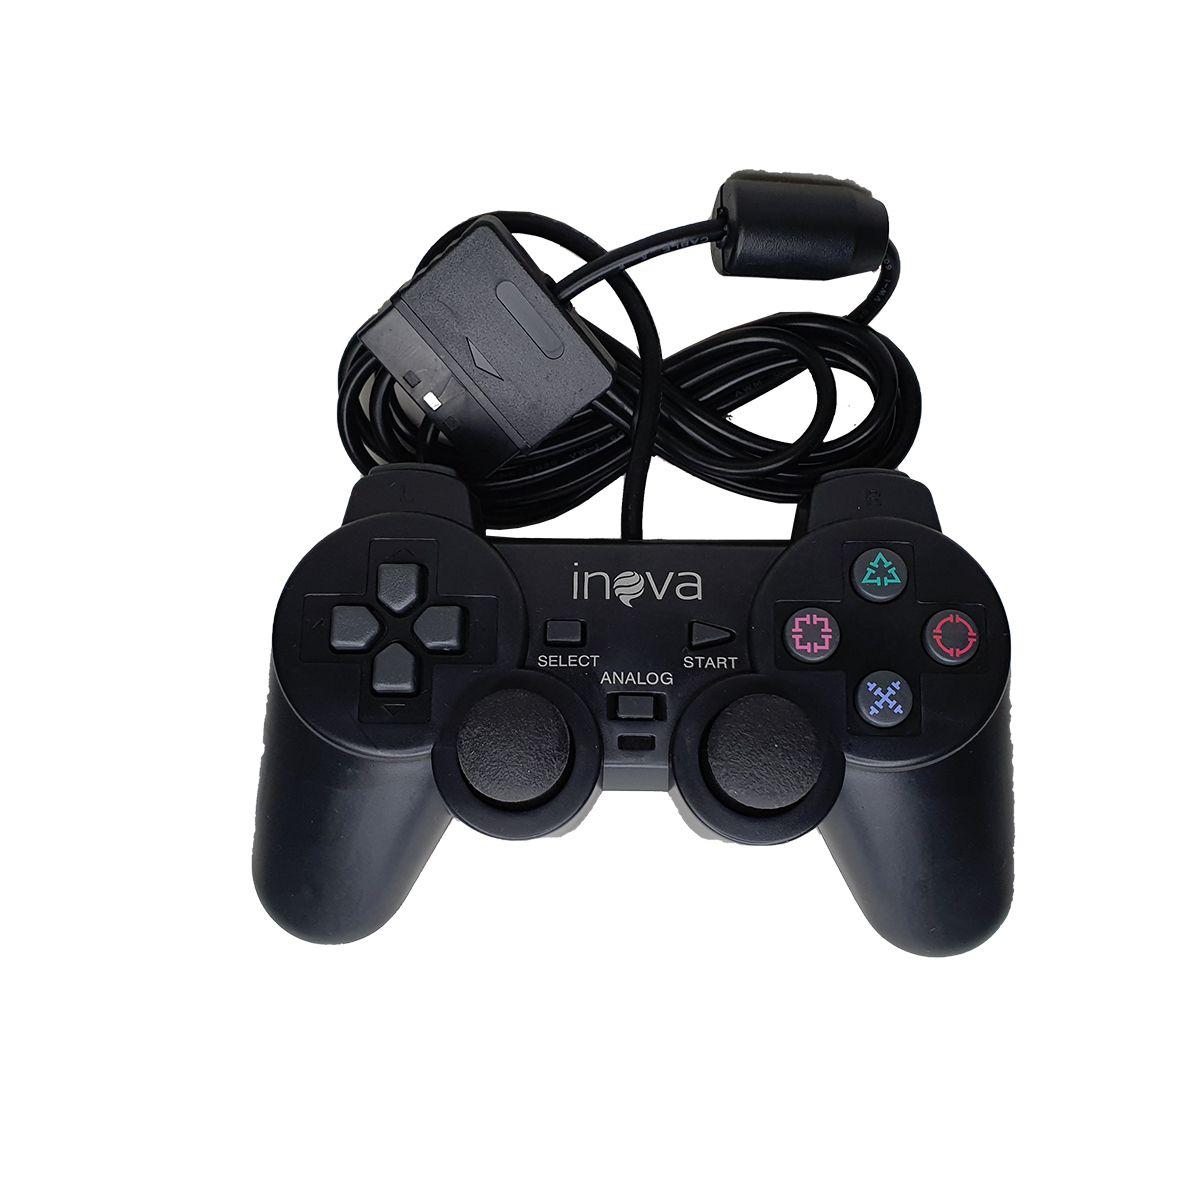 Controle JoyStick Play Dual Schock CON-8302 Inova